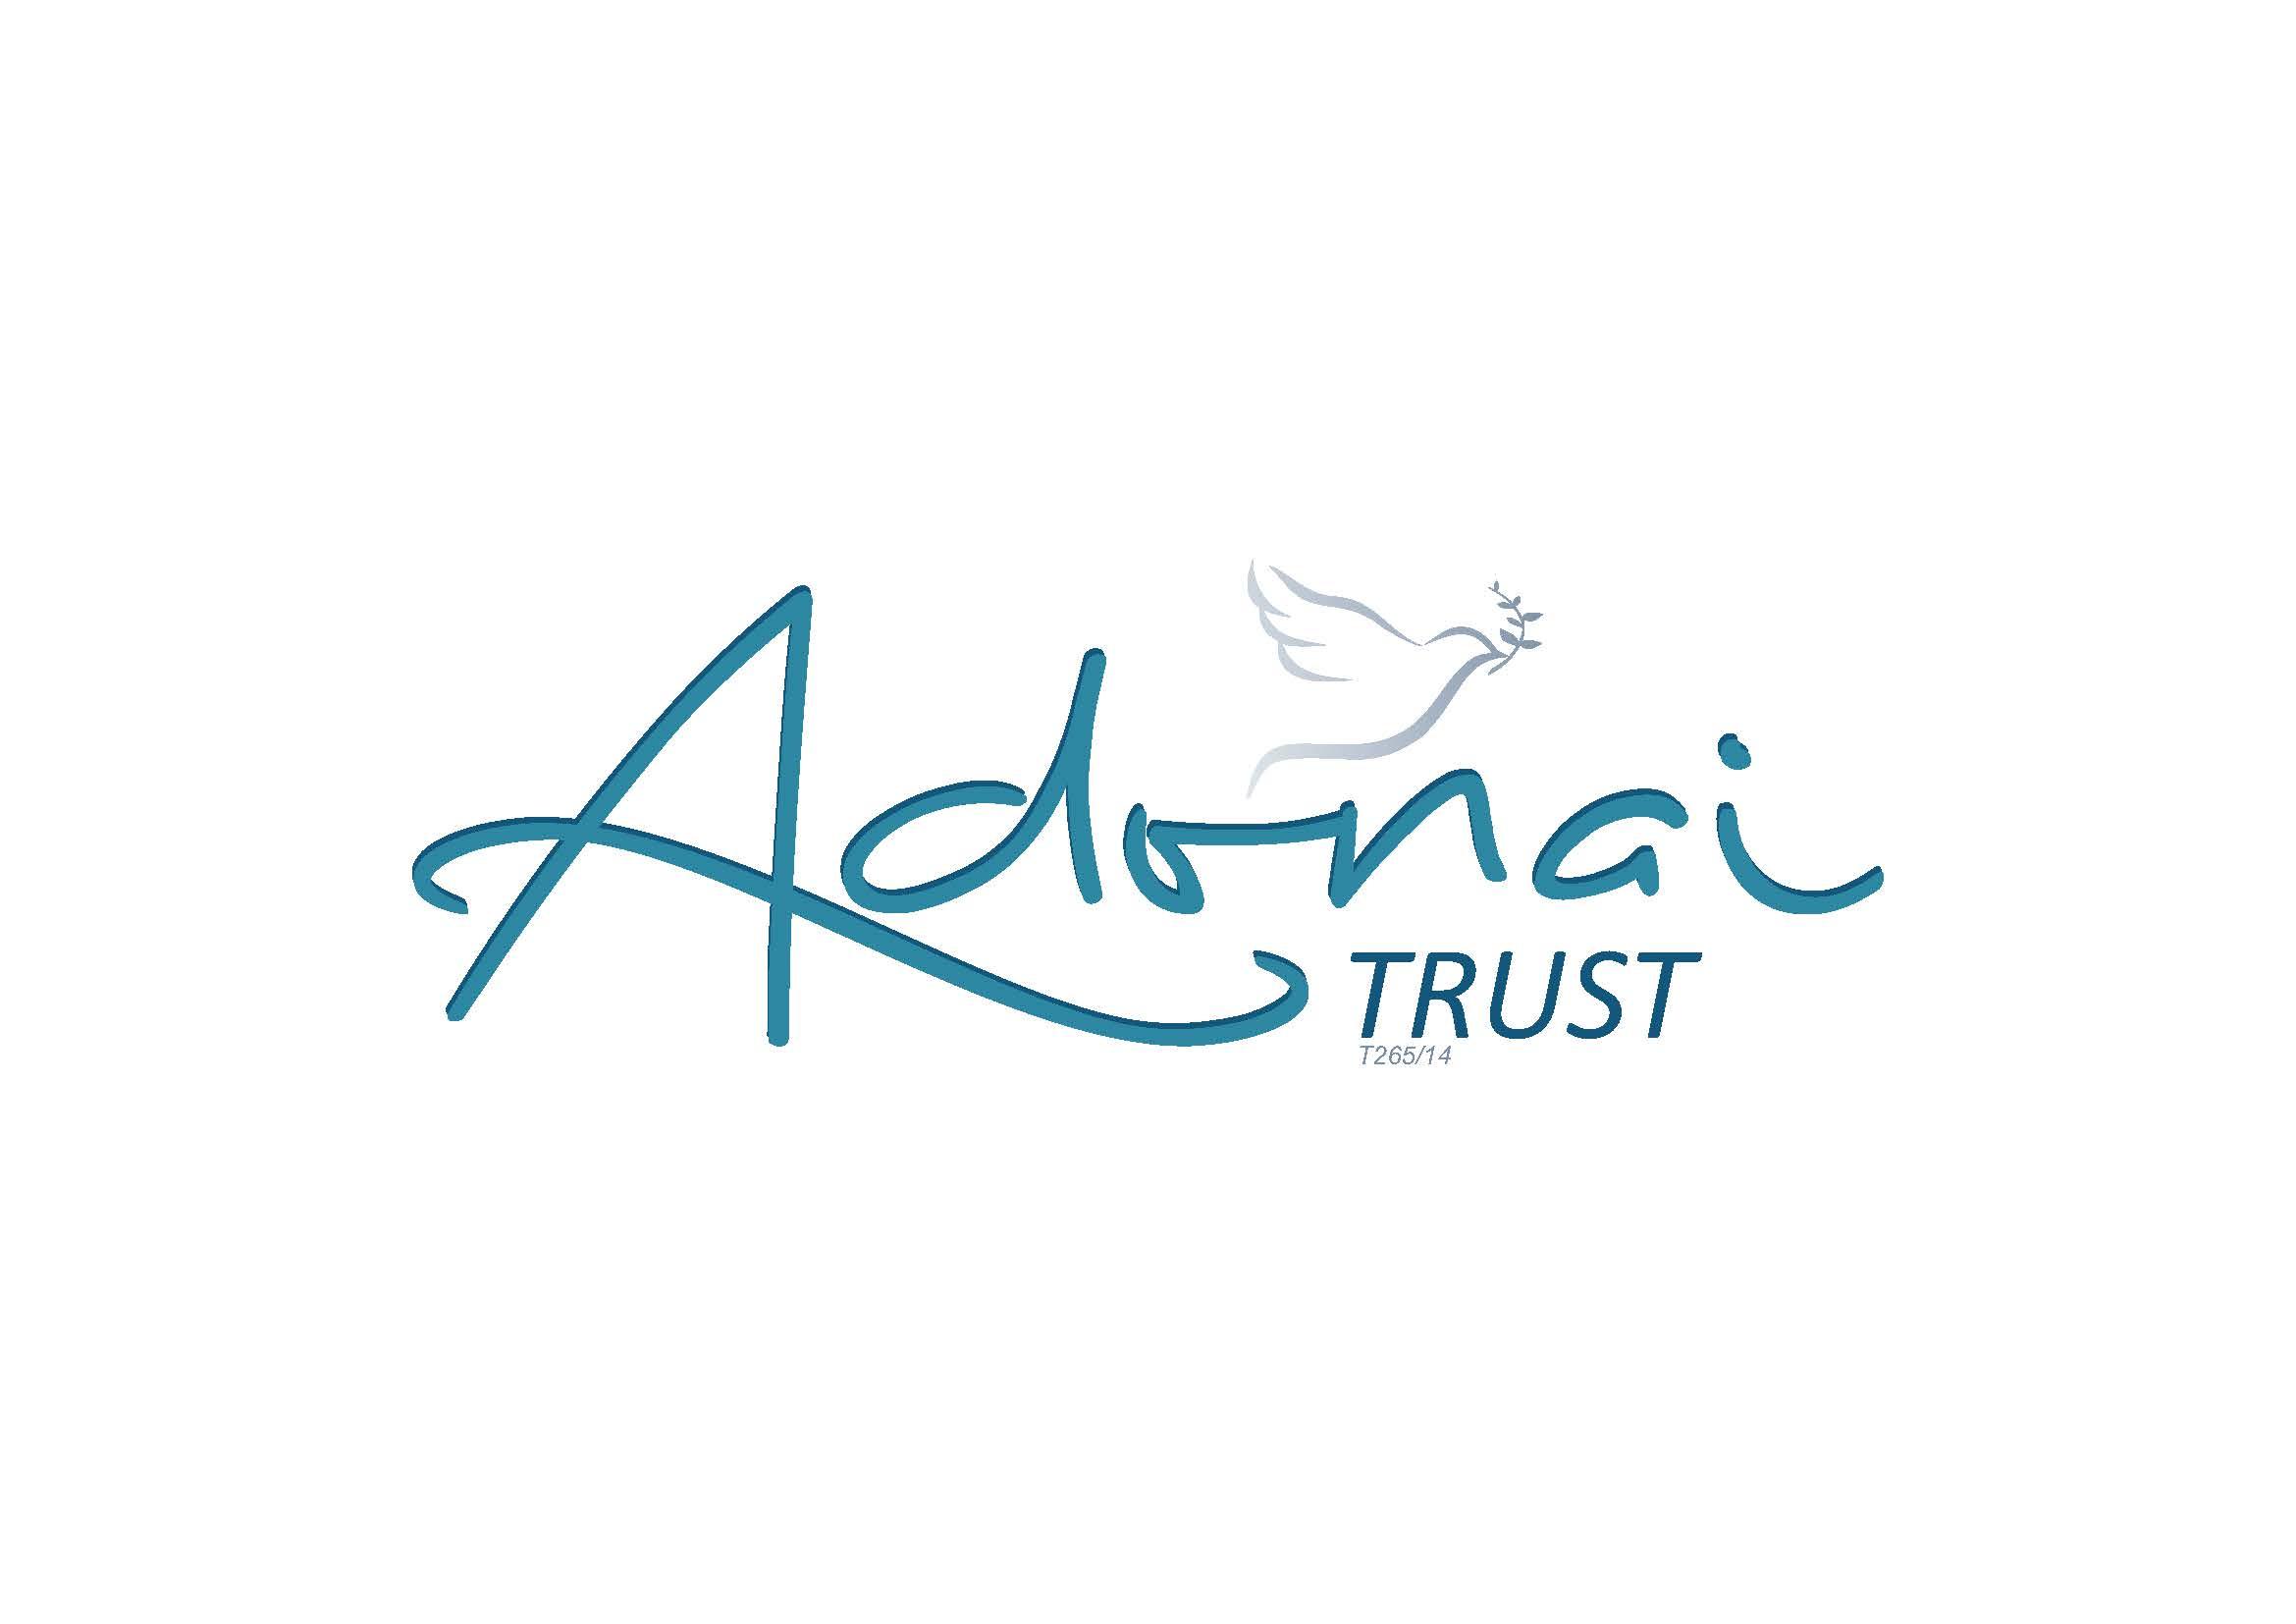 Adonai Trust Logo PDF